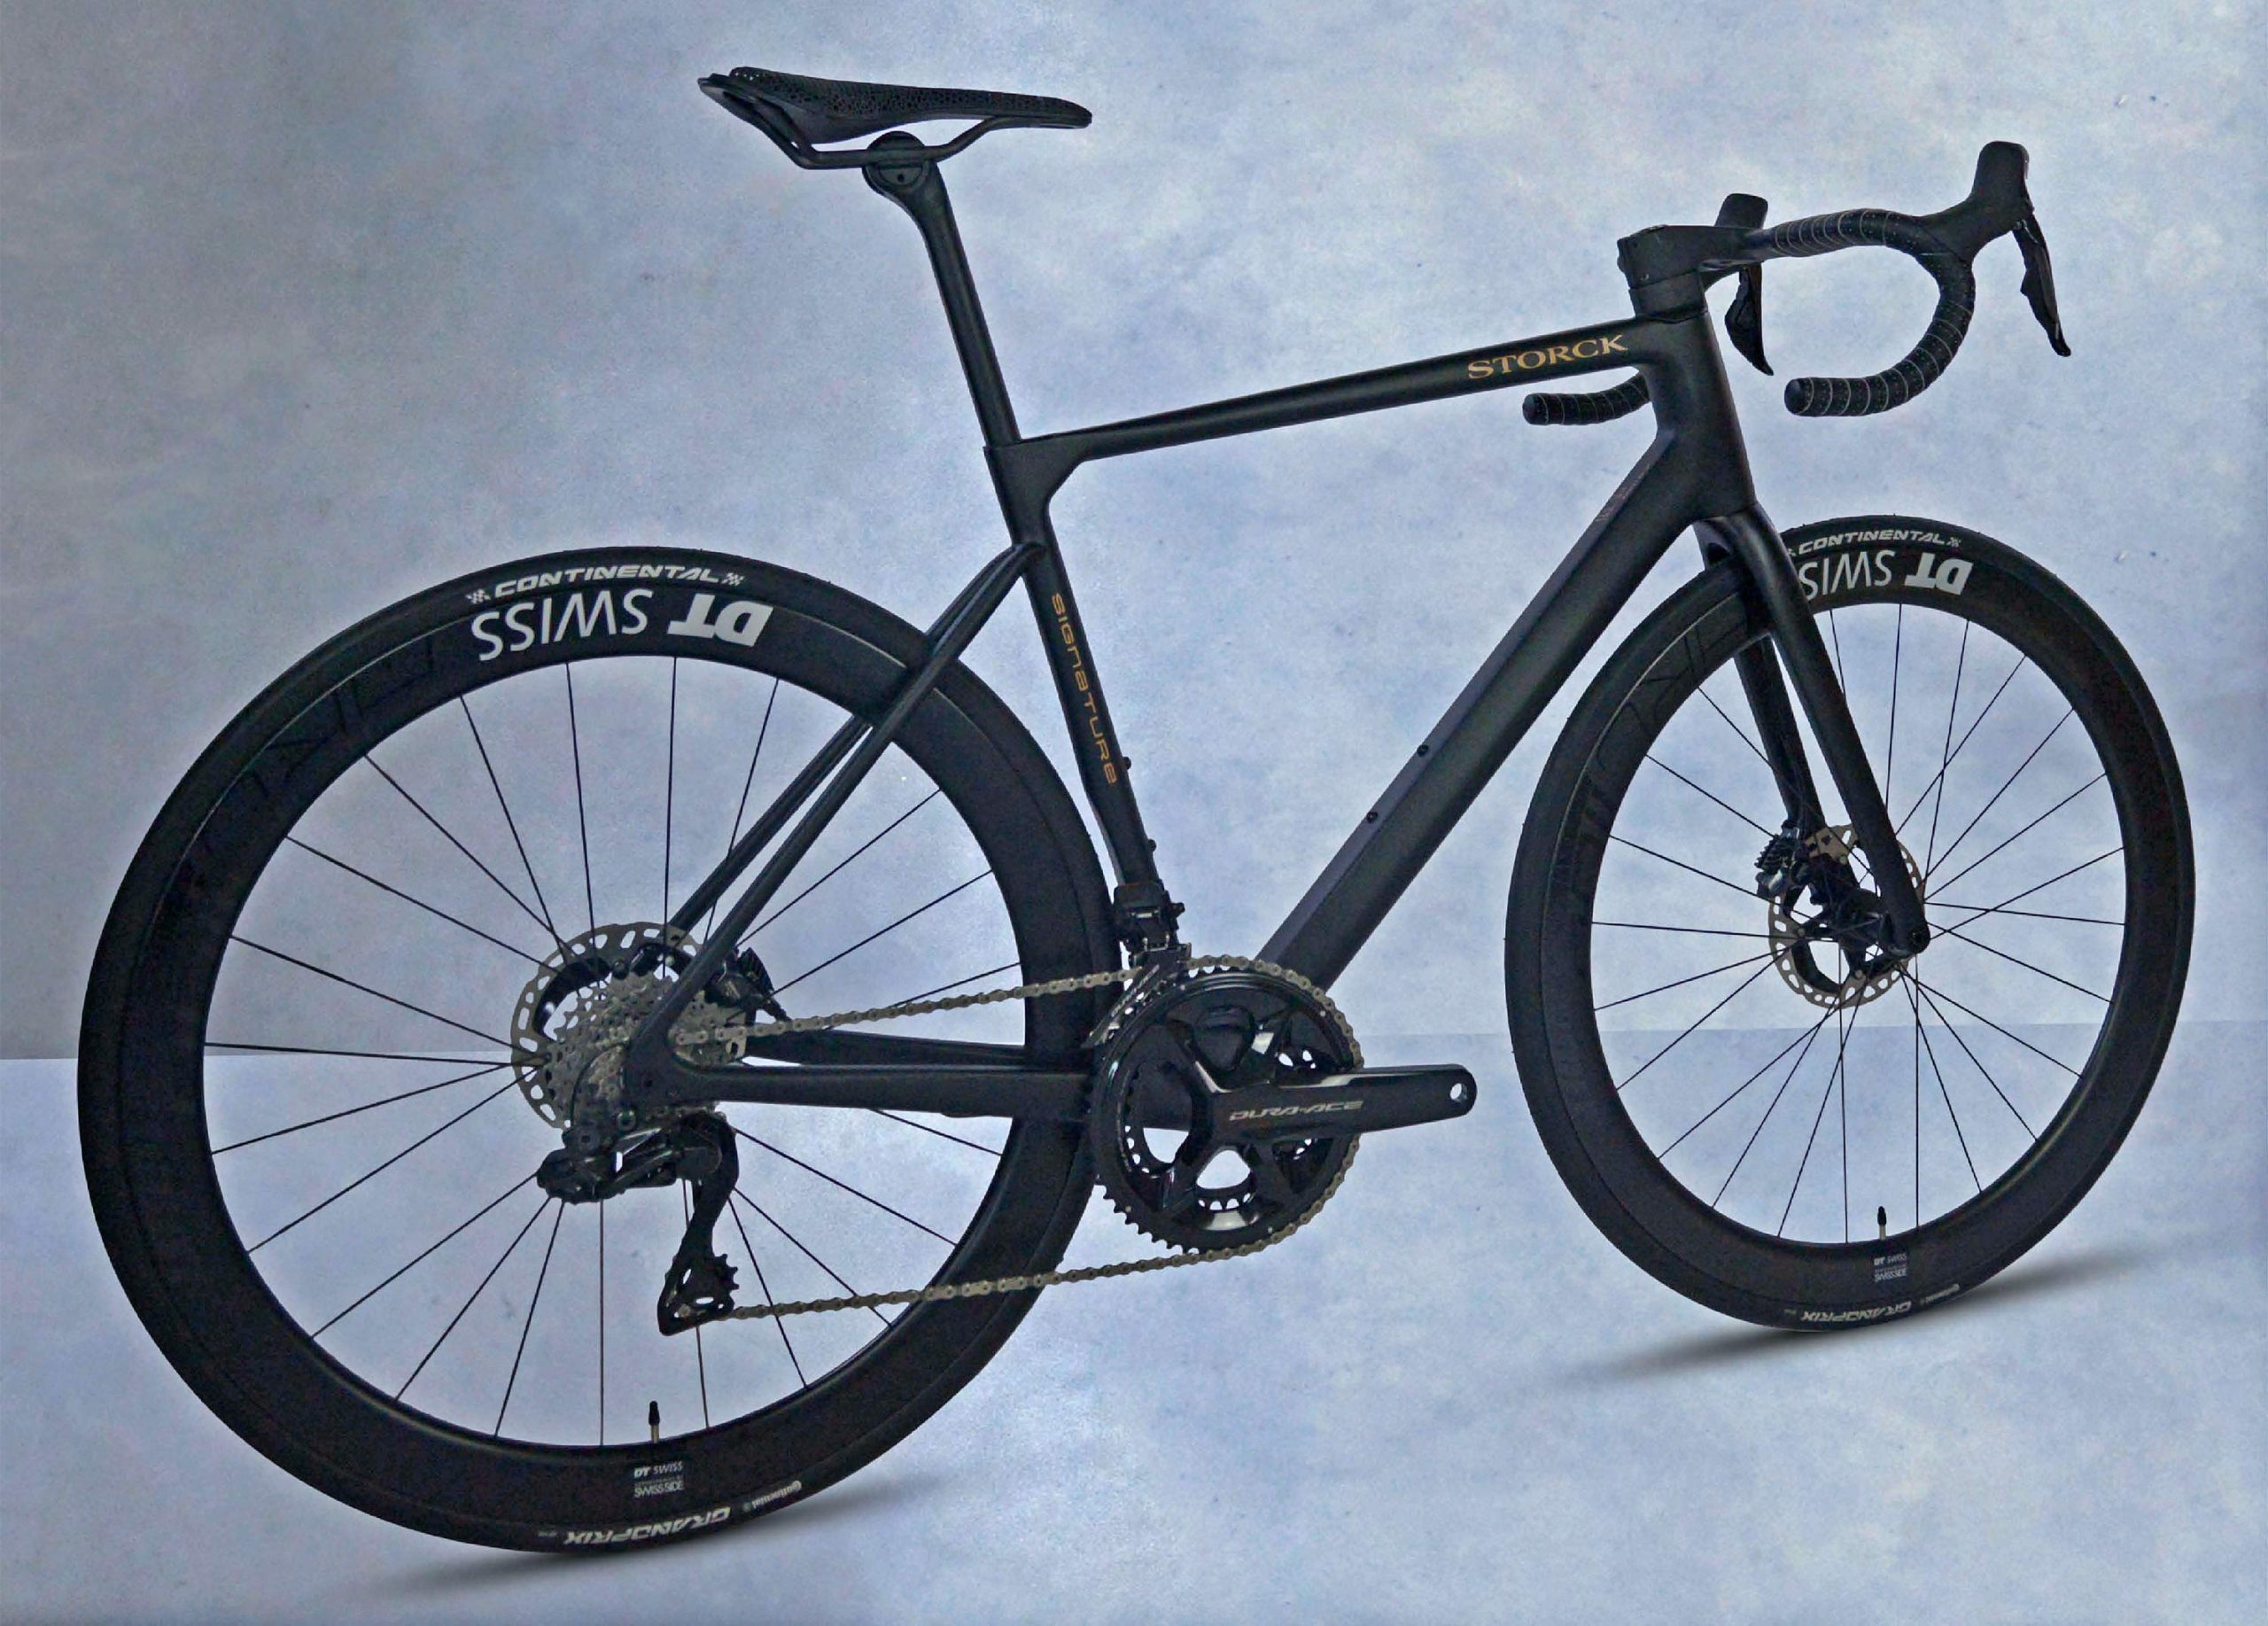 Bicicleta de estrada ultraleve de carbono Storck Aernario.3 Signature Disc